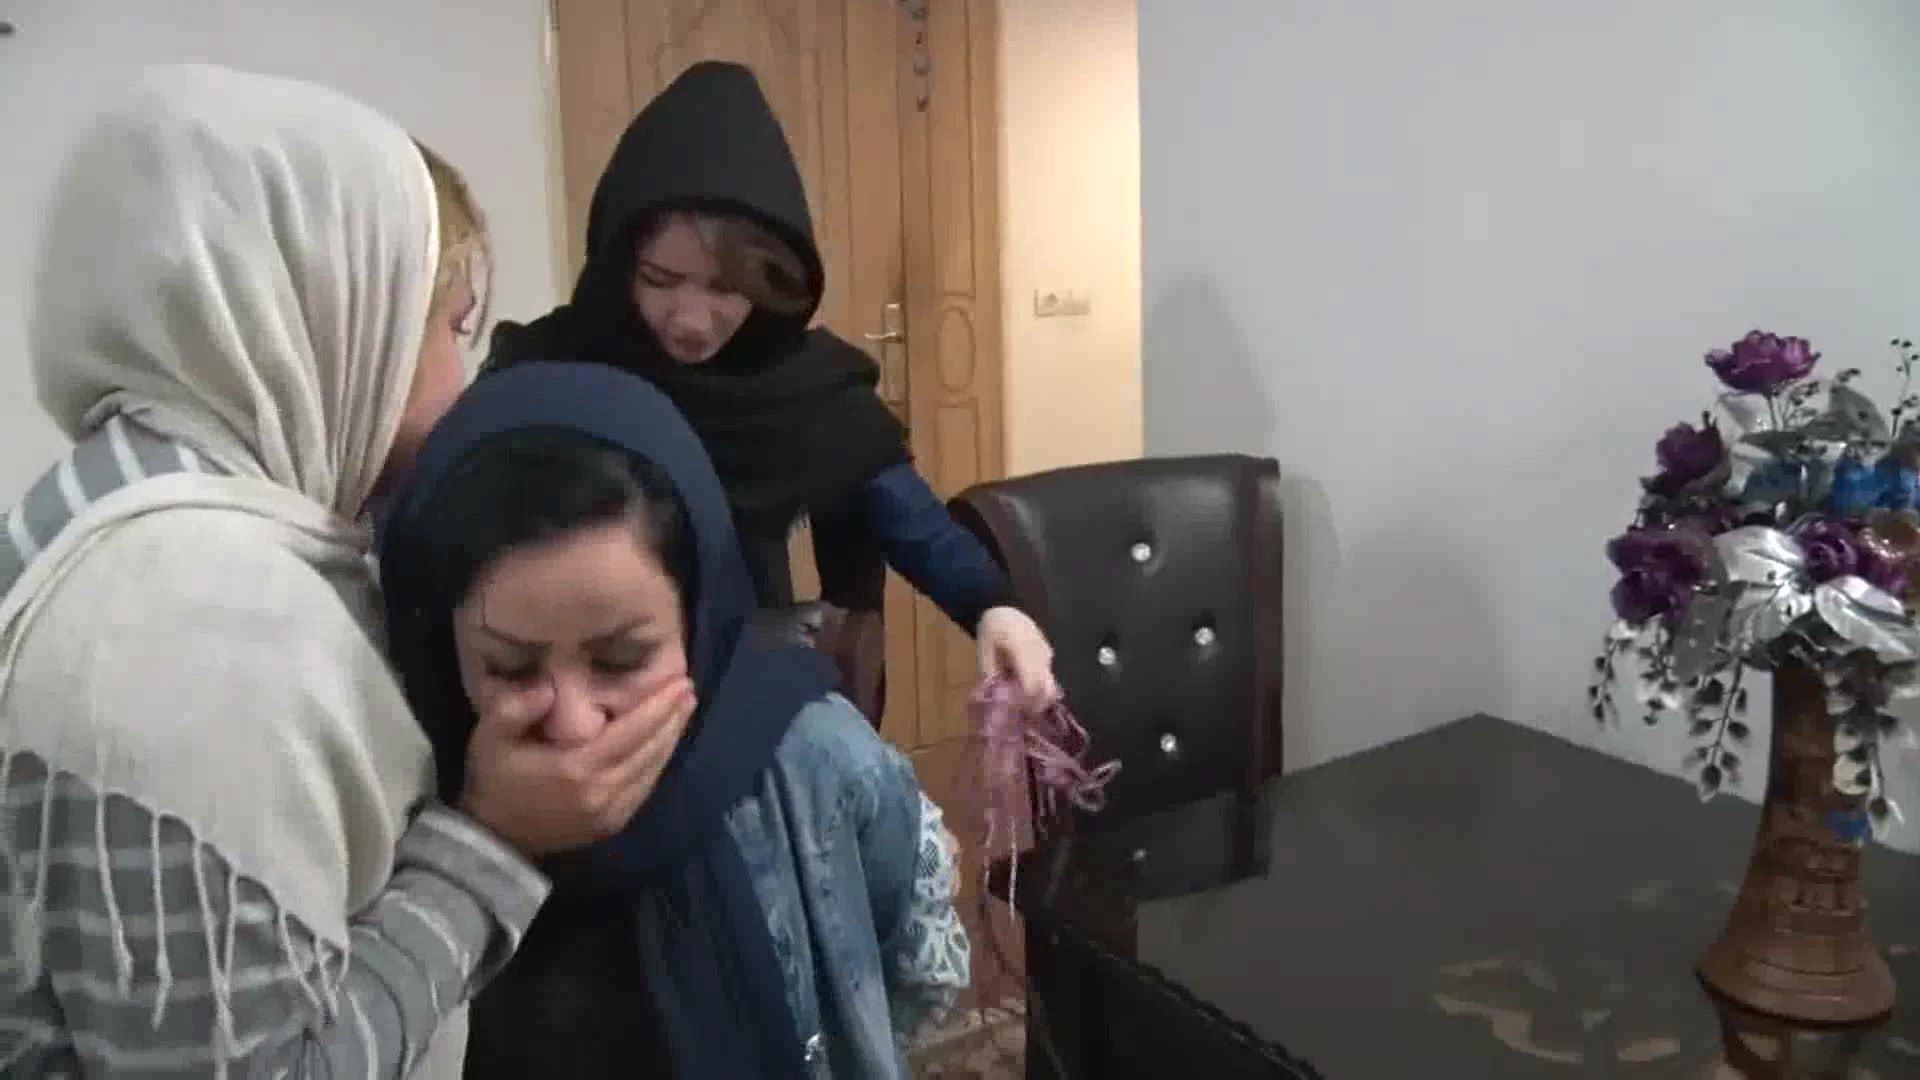 Arabic woman's group sex